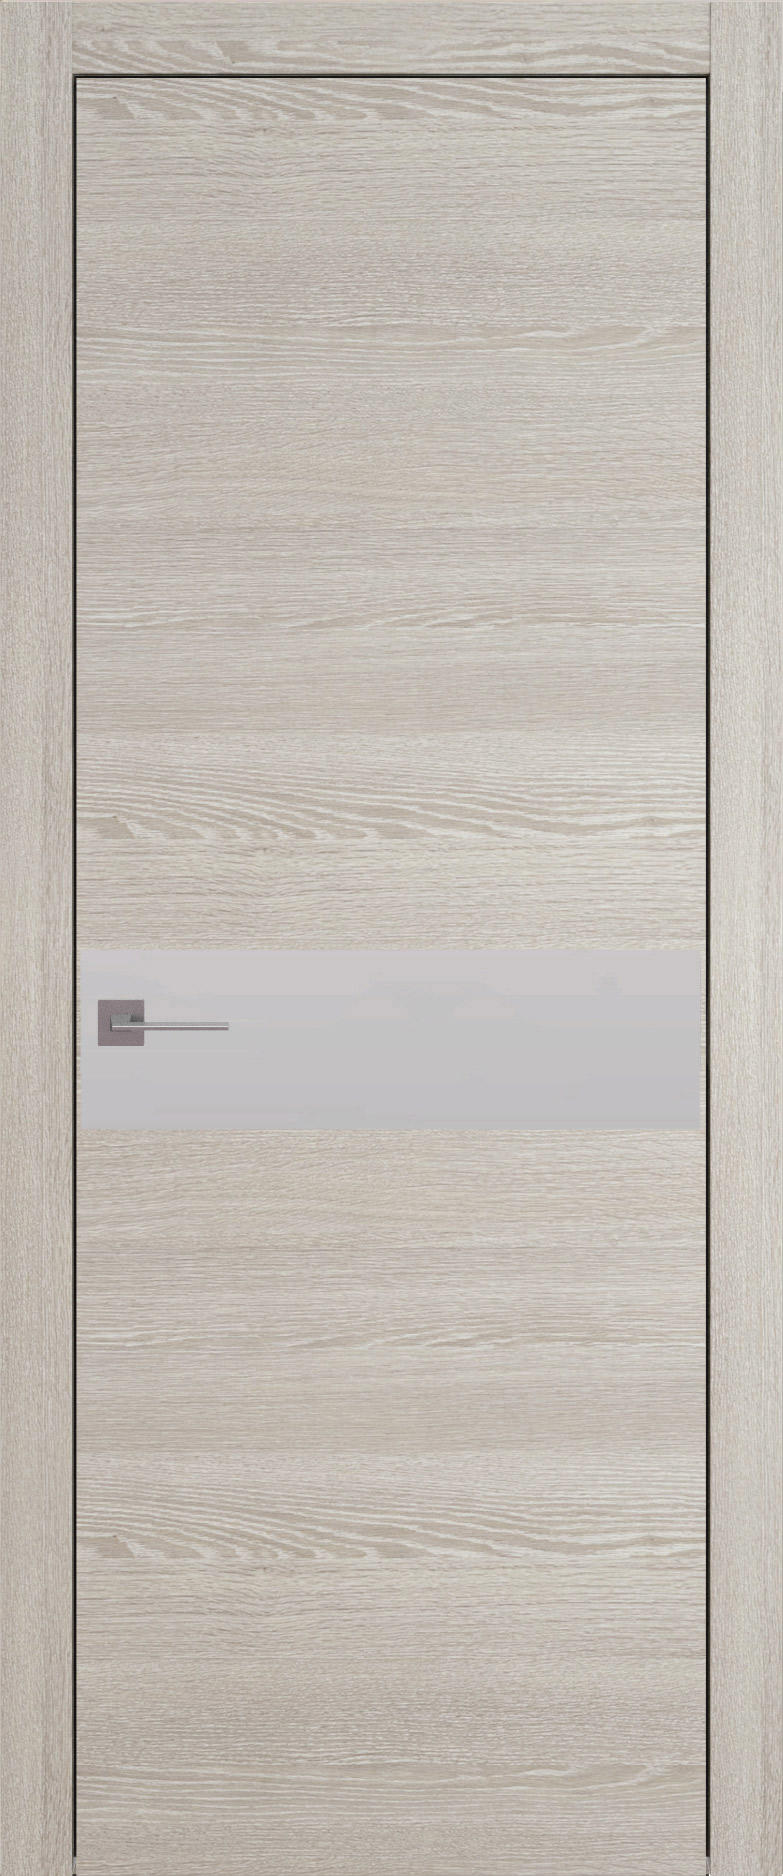 Tivoli И-4 цвет - Серый дуб Без стекла (ДГ)